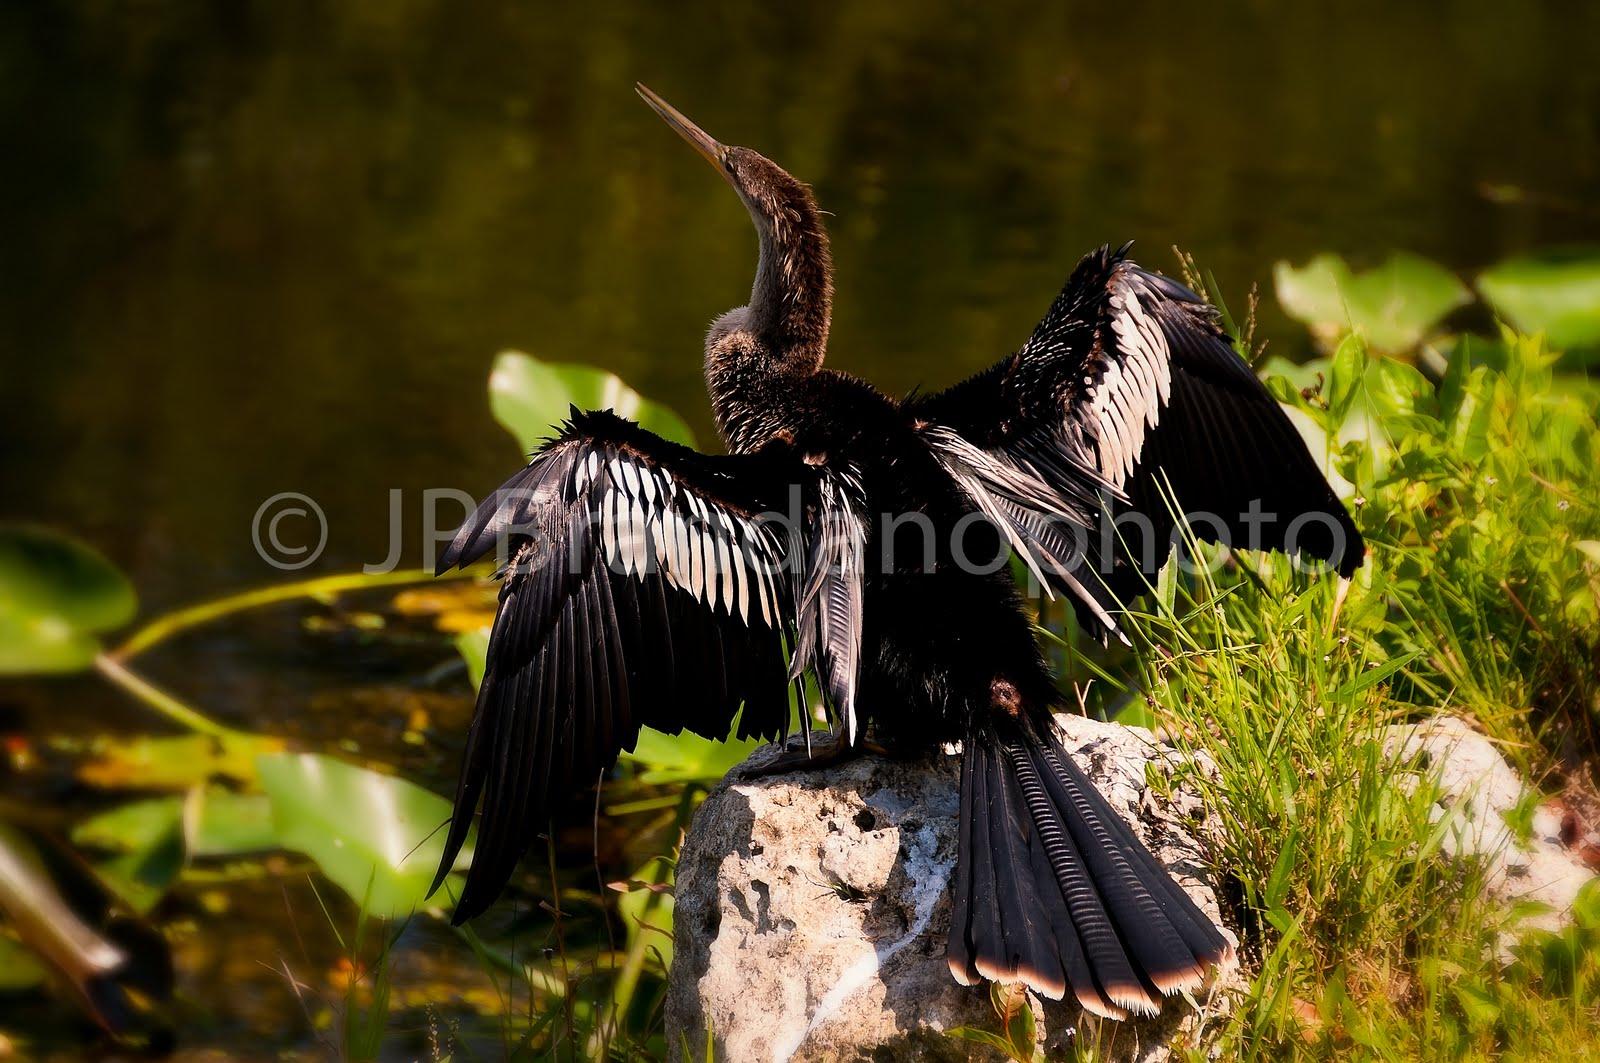 JP BRANDANO: FLORIDAS FINE ART PHOTOGRAPHERS: SHEENA